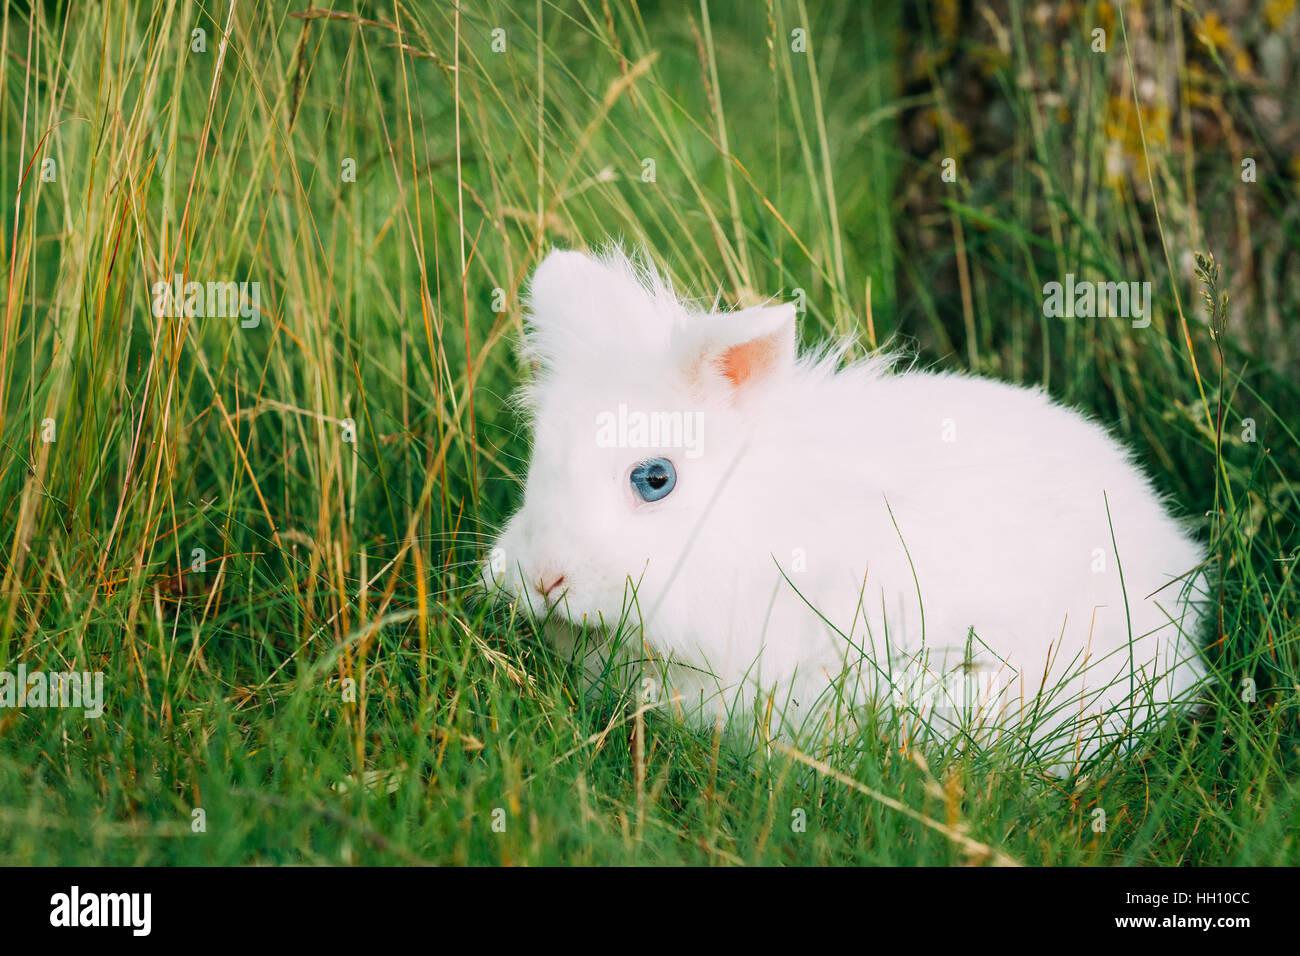 Decorative rabbits: breeds, their description and photo. Domestic dwarf rabbits: description, care, content 71